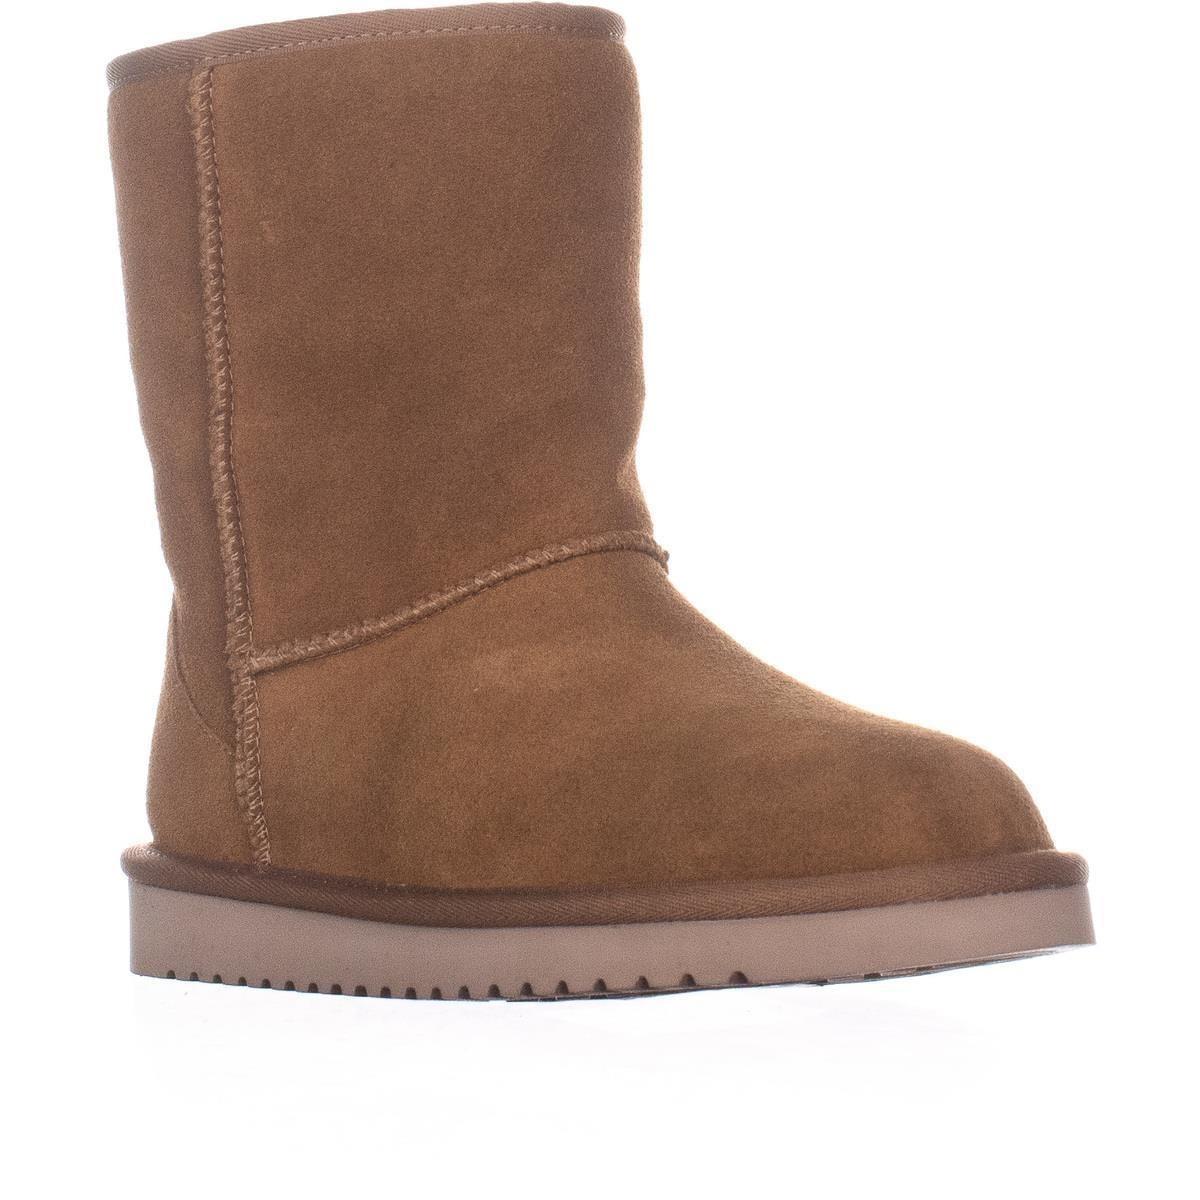 226d5722c38 Koolaburra by UGG Koola Short Mid Calf Boots, Chestnut